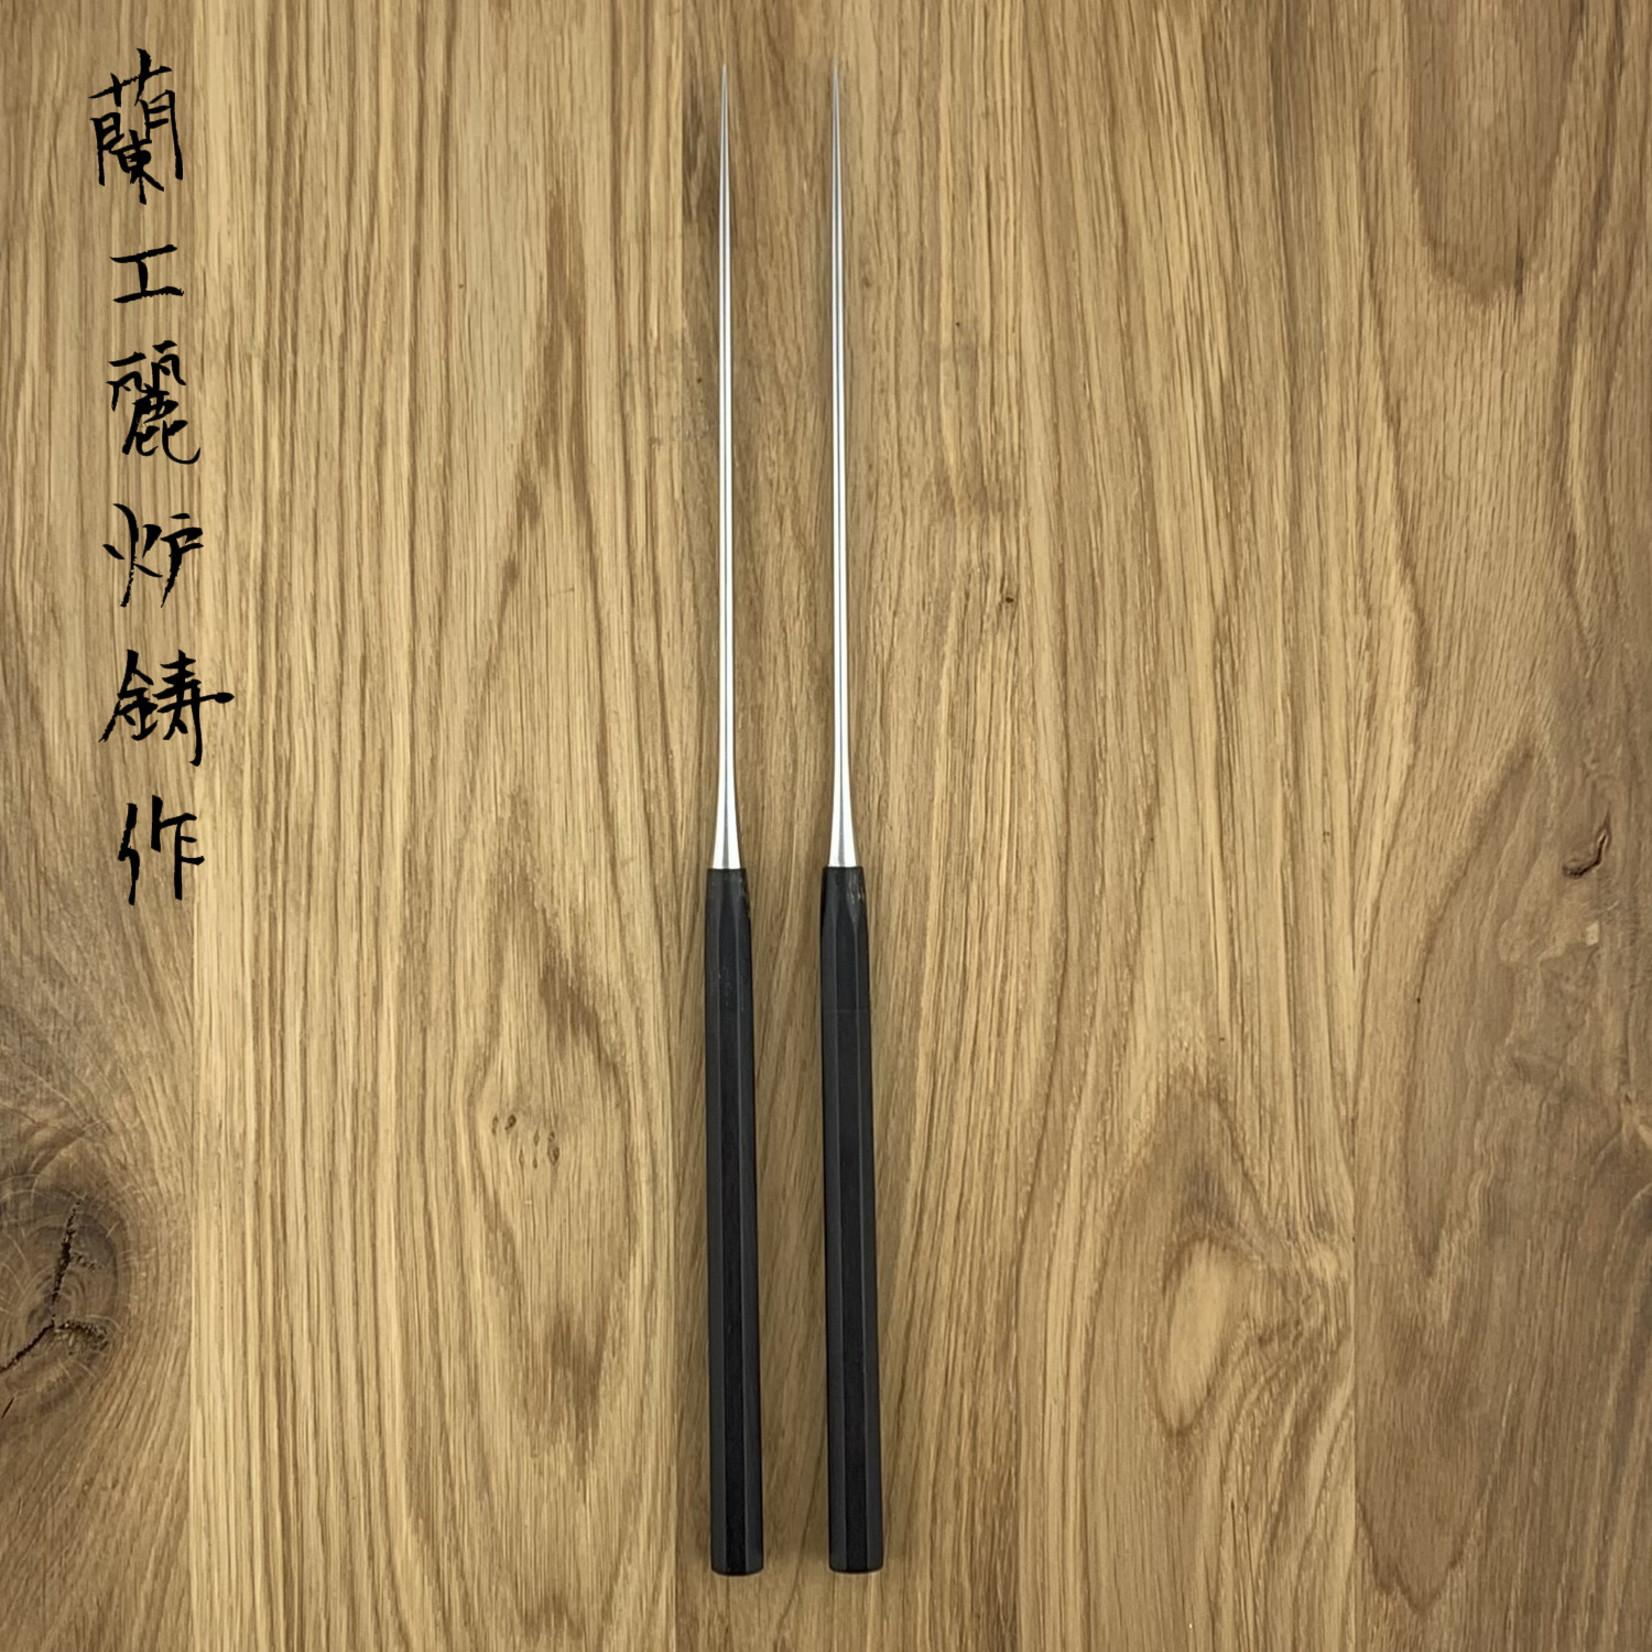 TAKAYUKI ebony chopsticks 180 mm Moribashi 09016